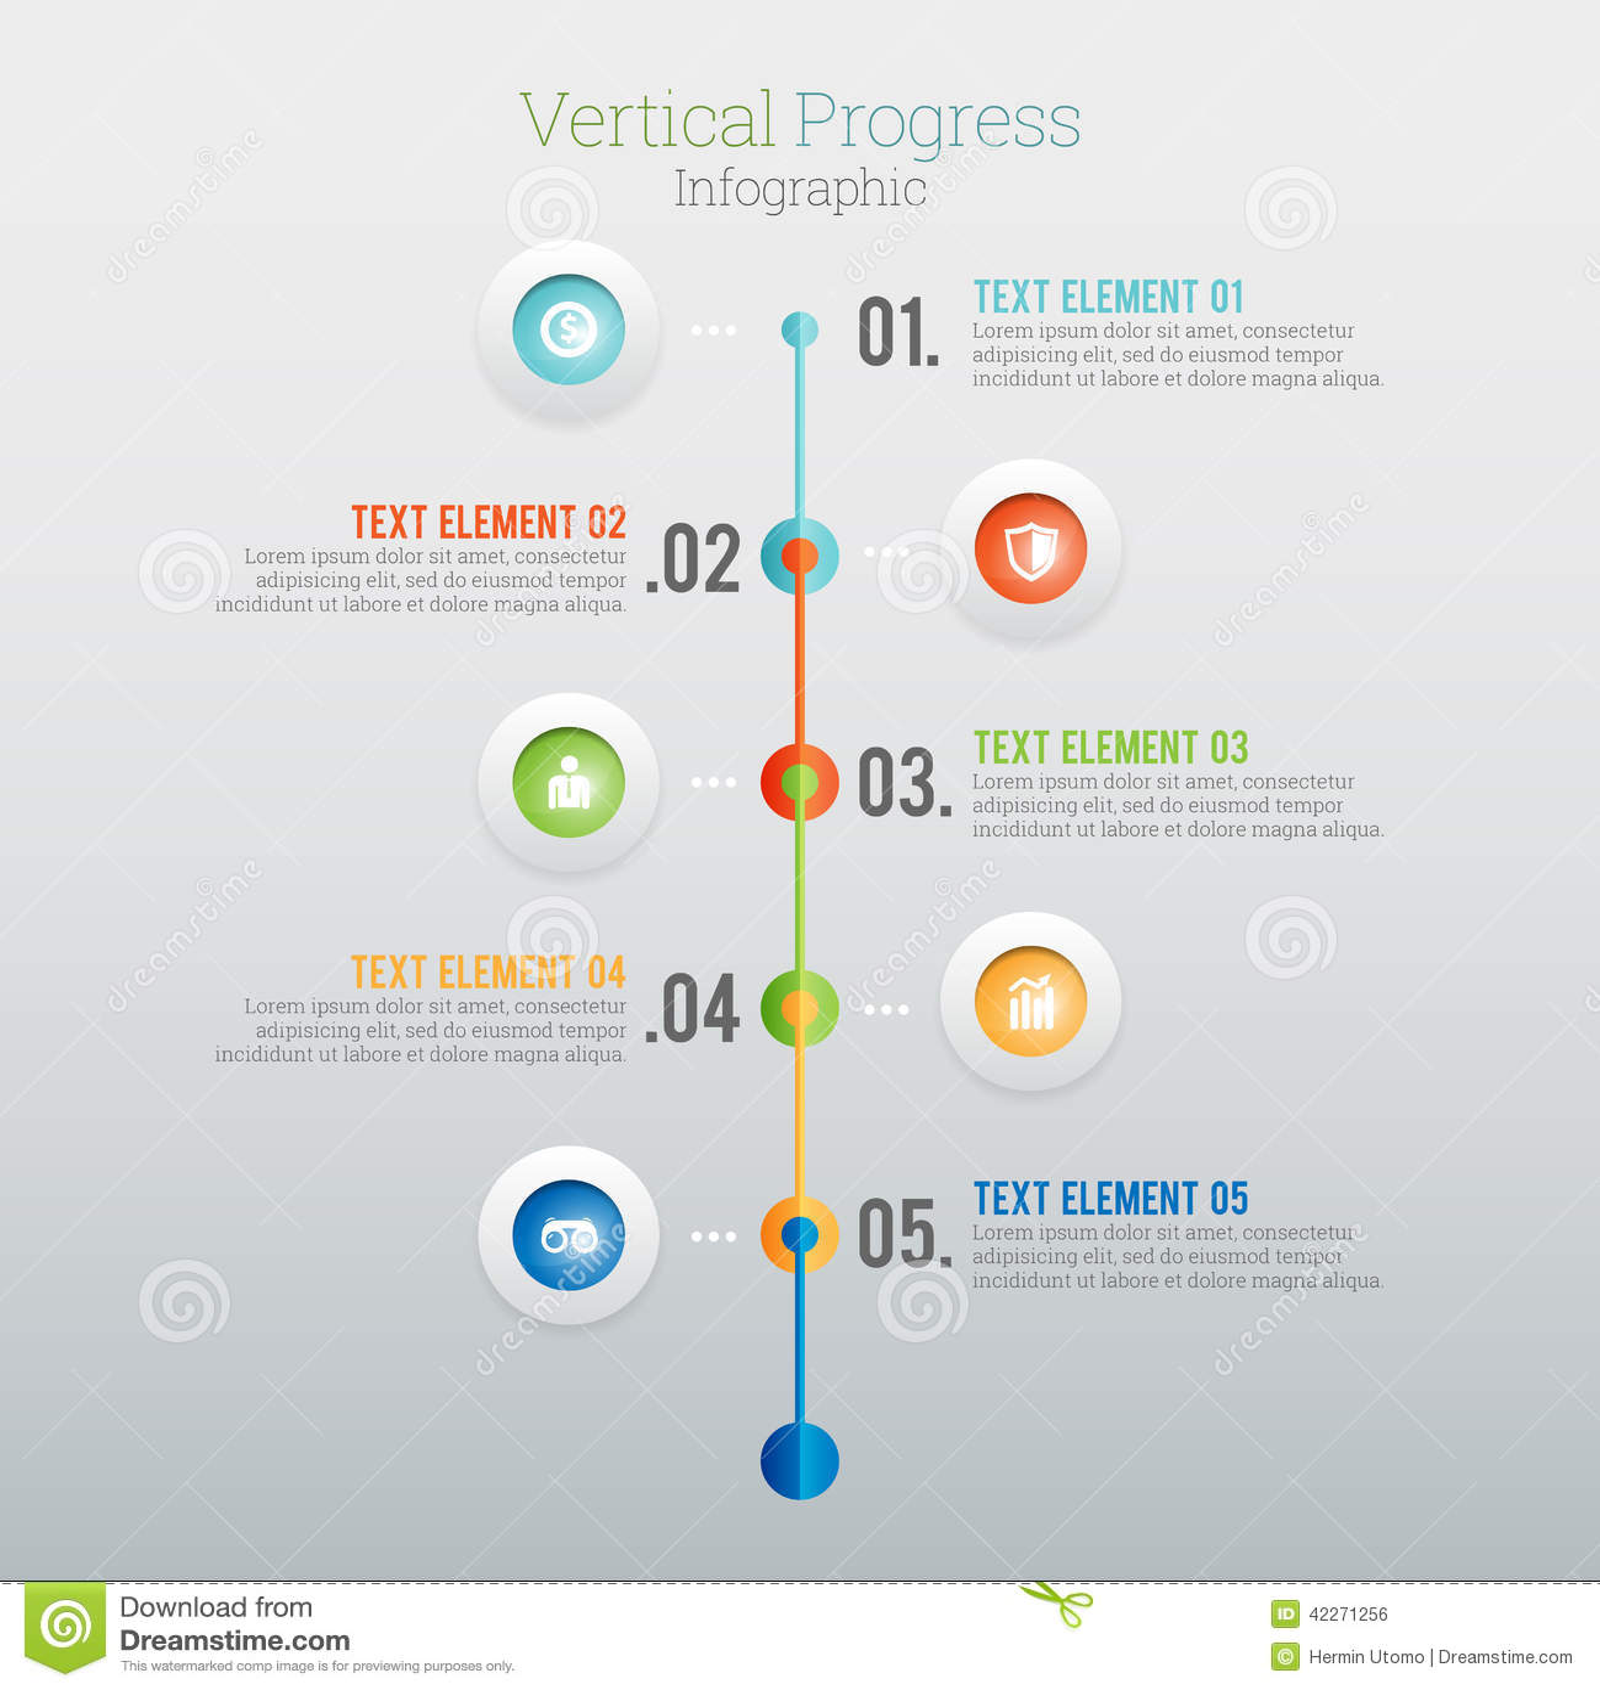 vertical progress infographic stock vector - illustration of